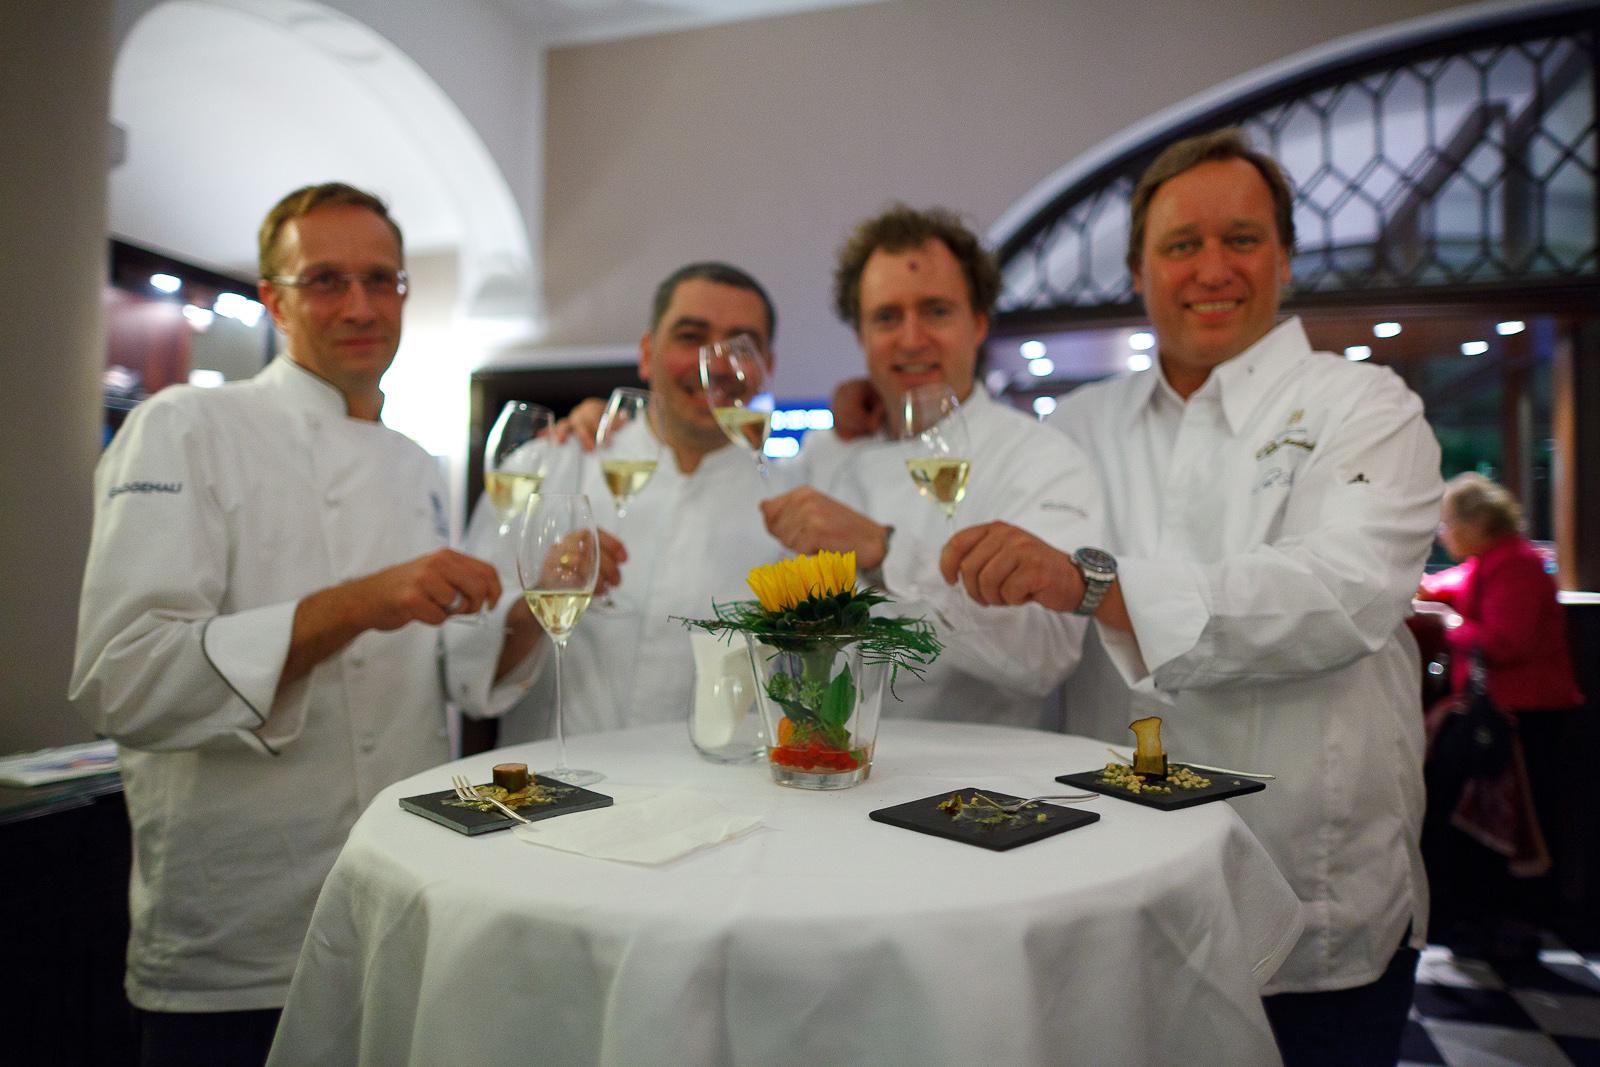 Chefs Nils Henkel (Schlosshotel Lerbach), Christian Bau (Schloss Berg), Sven Elverfeld (Aqua), and Thomas Bühner (La Vie)